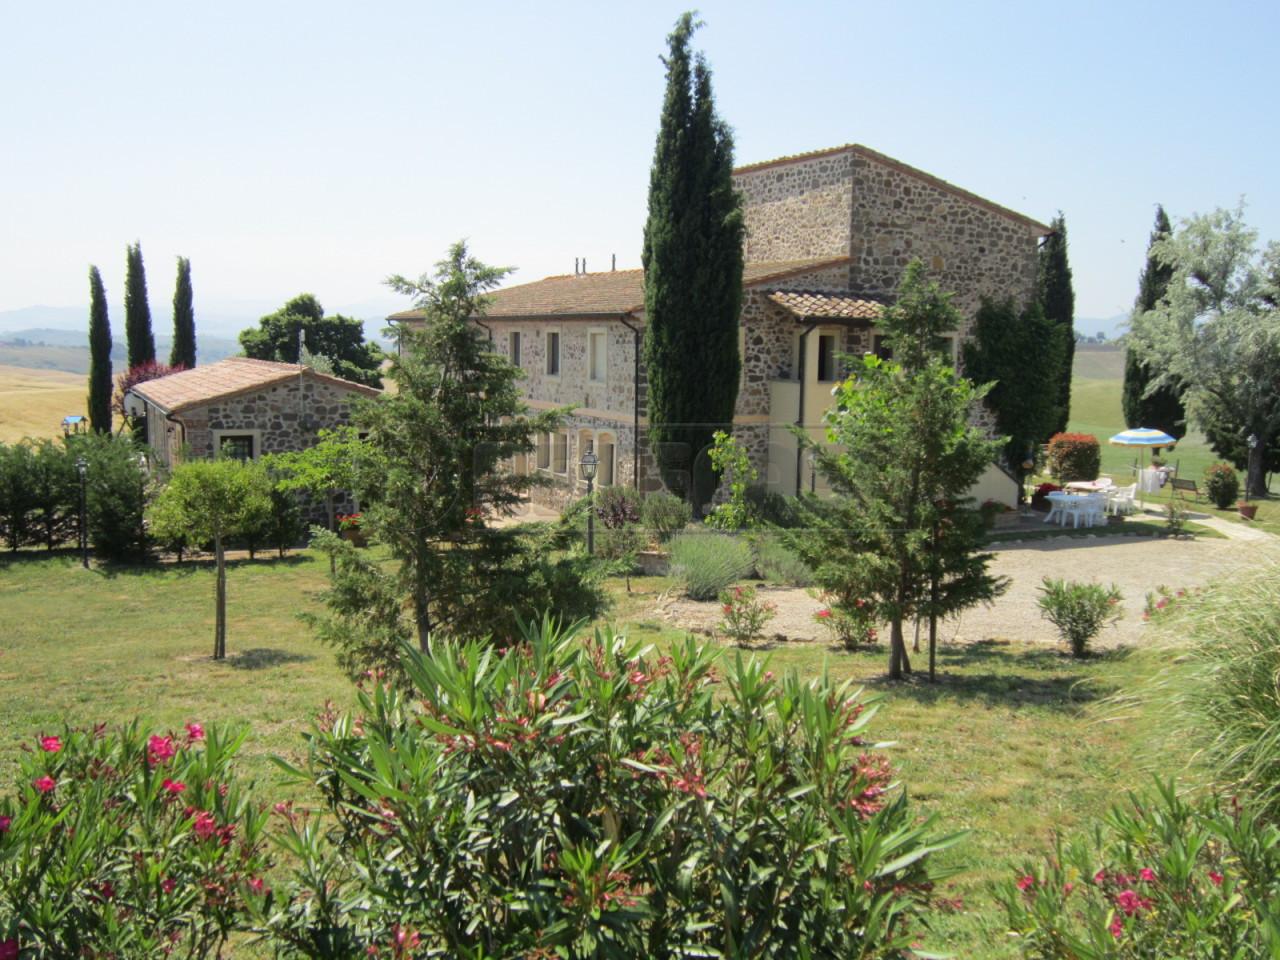 Agriturismo in Vendita a Montecatini Val di Cecina